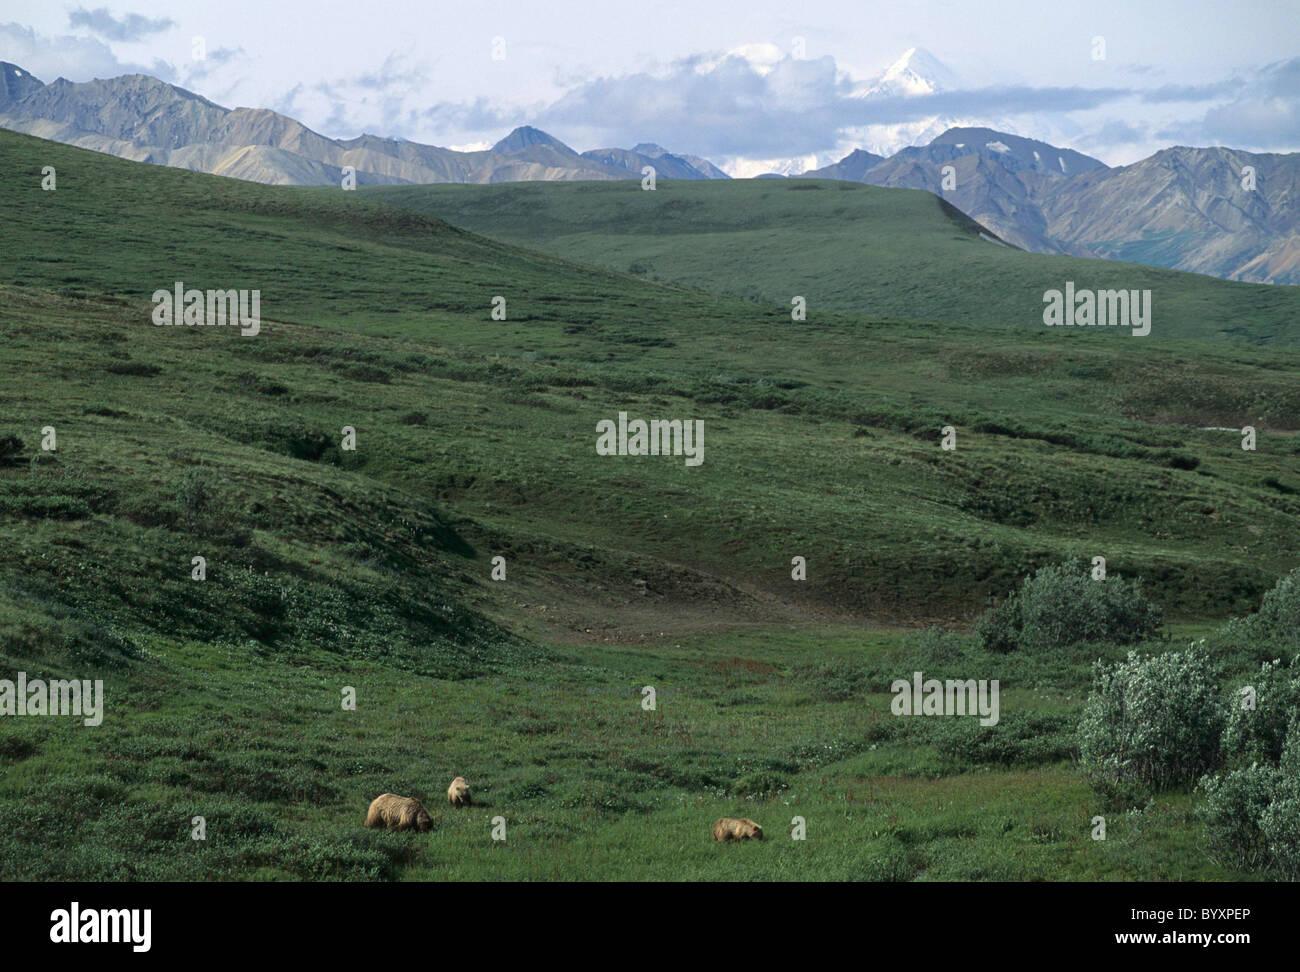 Siembre y Cubs, Grizzly Bear, el Parque Nacional Denali, Alaska, oso pardo, osos, osos pardos, osos pardos Foto de stock